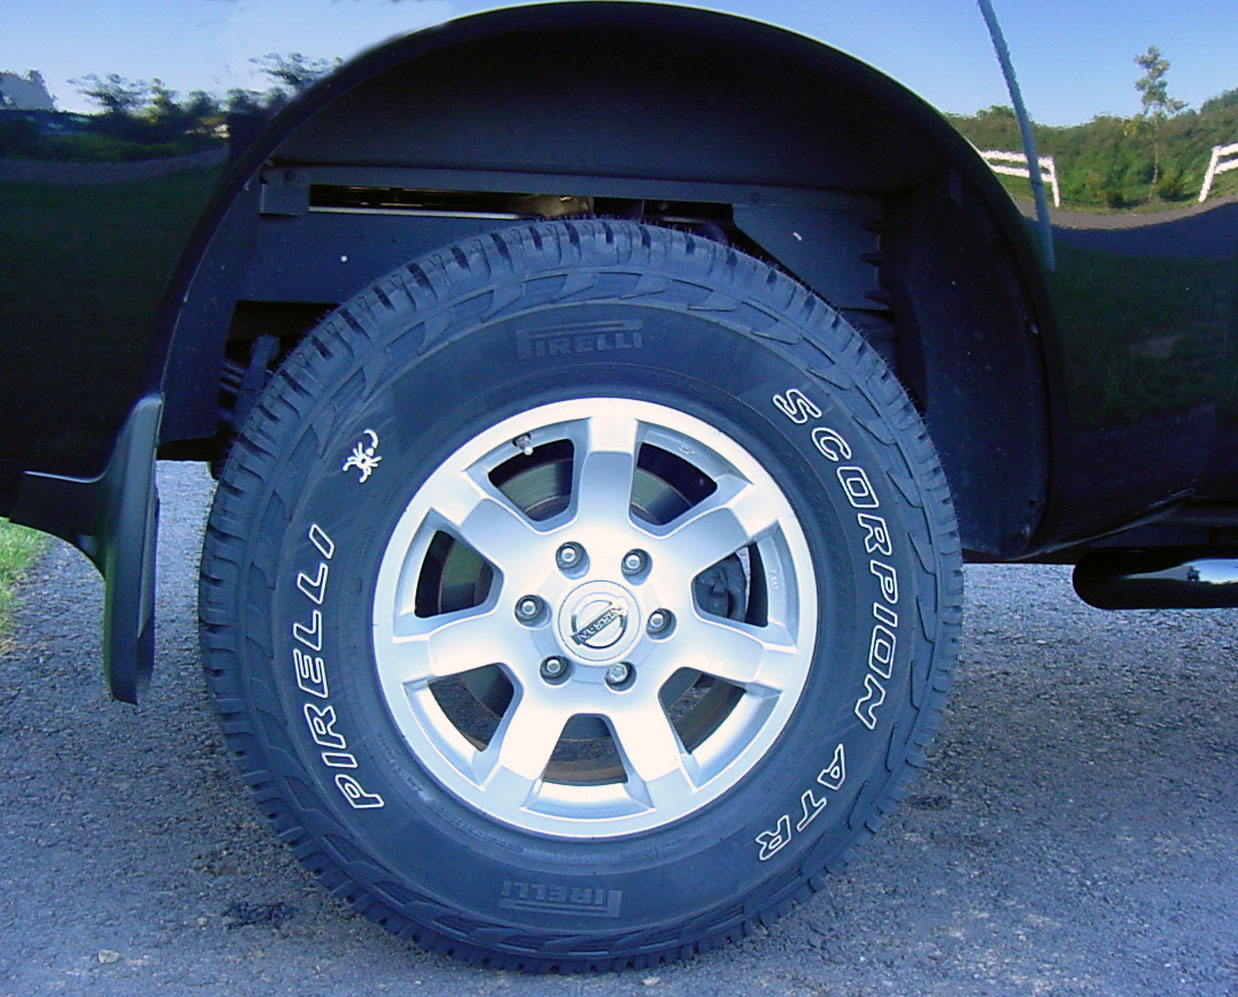 Pirelli Scorpion ATR!!!!! - Nissan Titan Forum